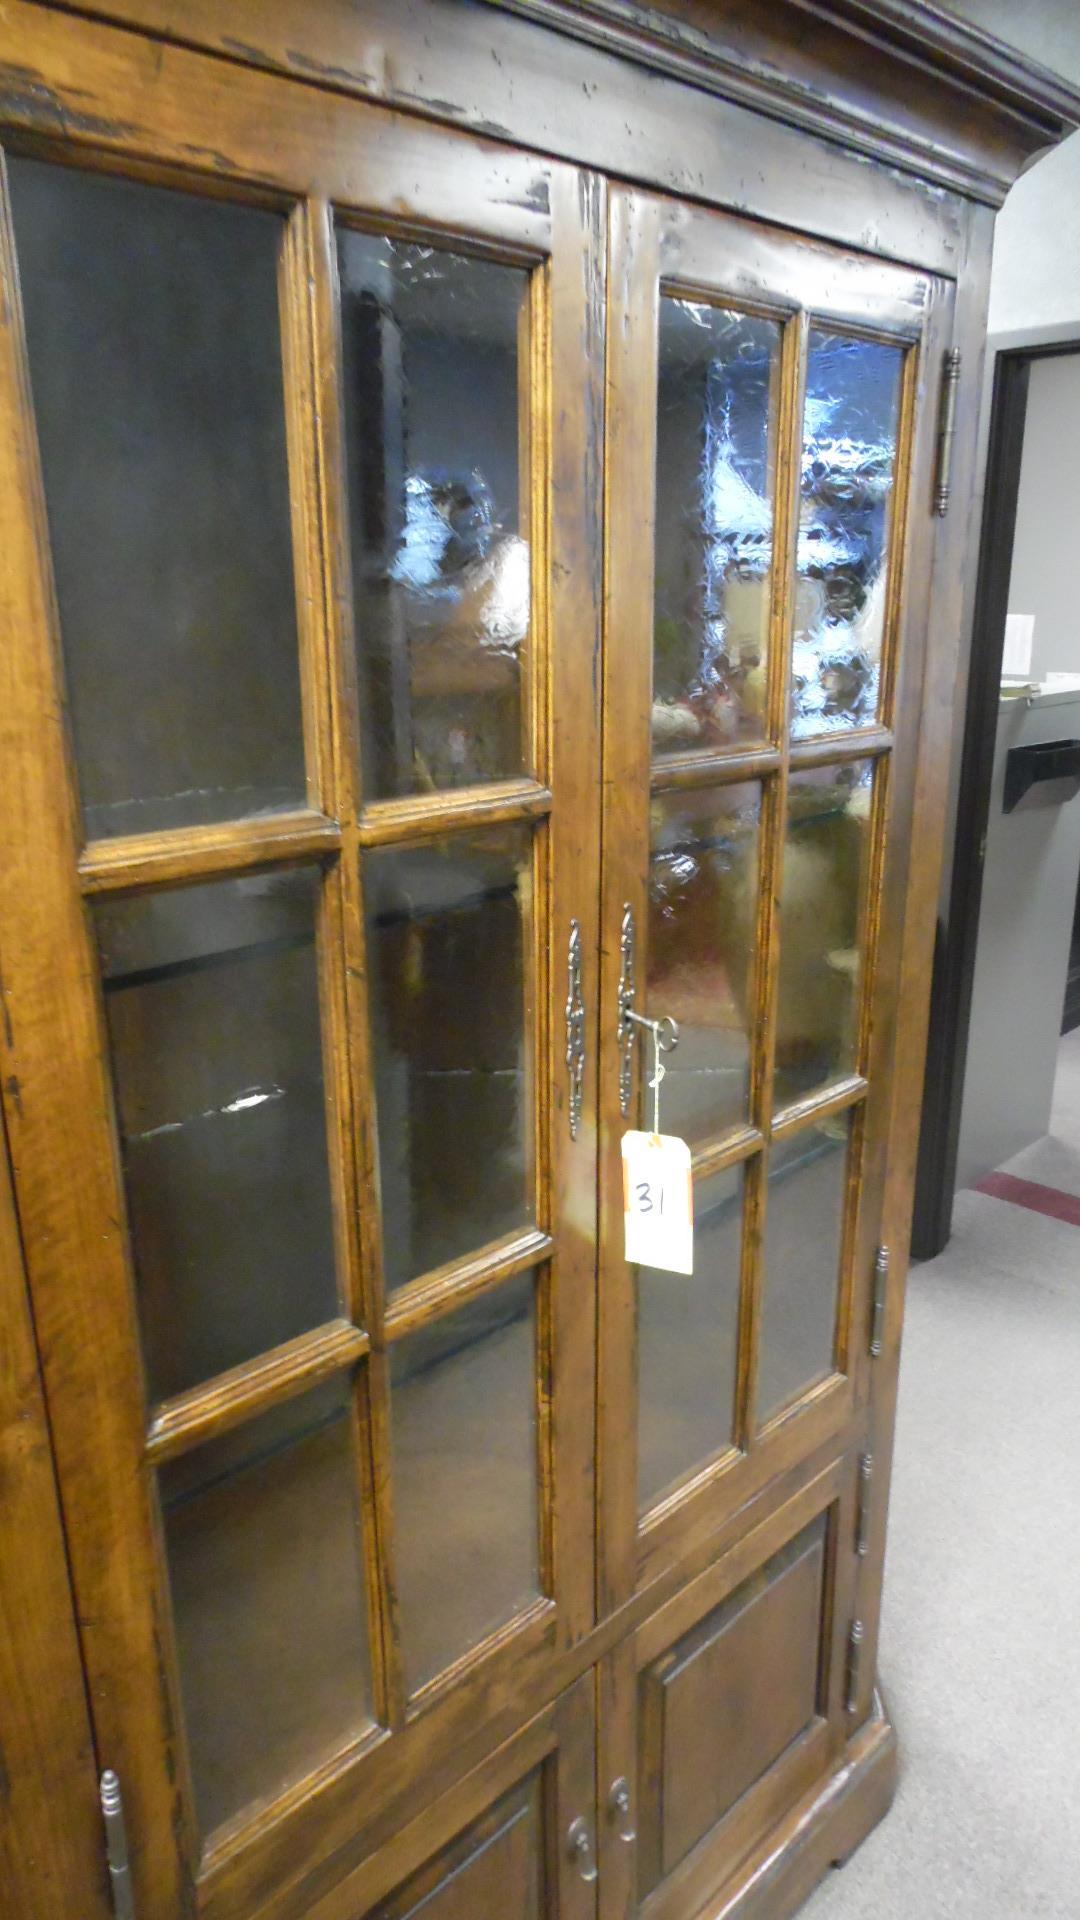 Lot 31 - RUSTIC CABINET w/ GLASS SHELVES